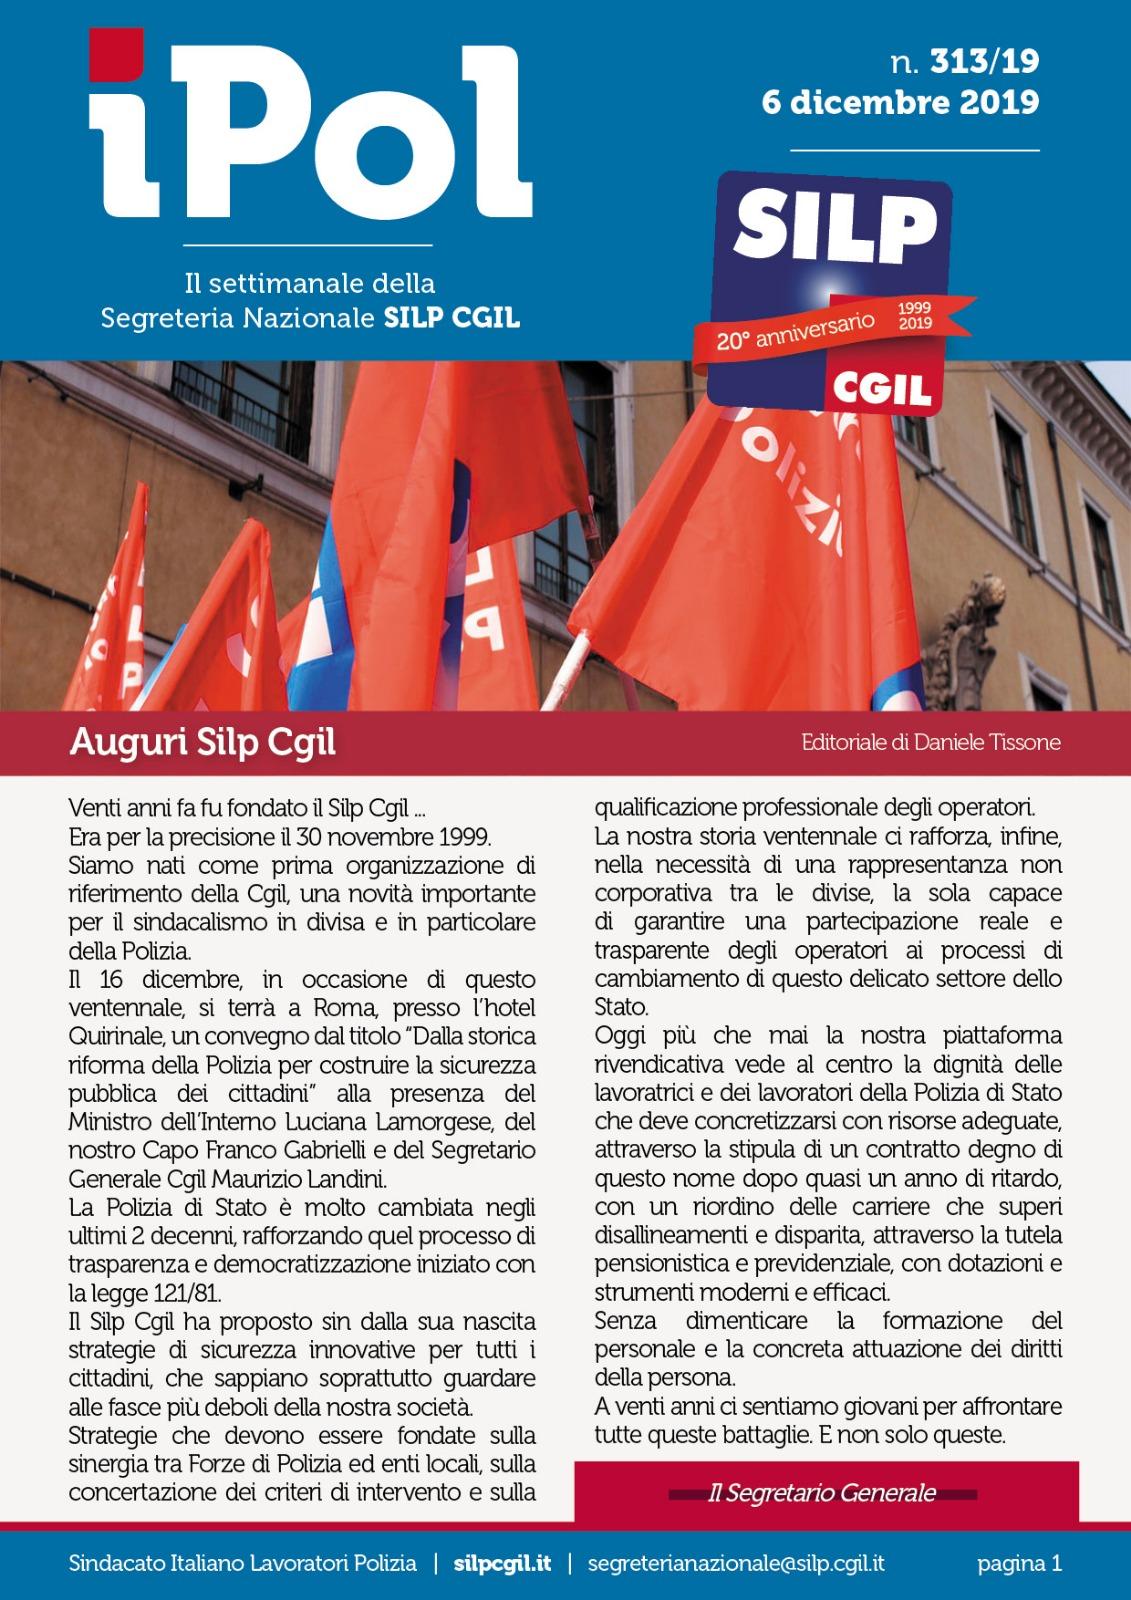 IPOL settimanle Silp 6.12.19